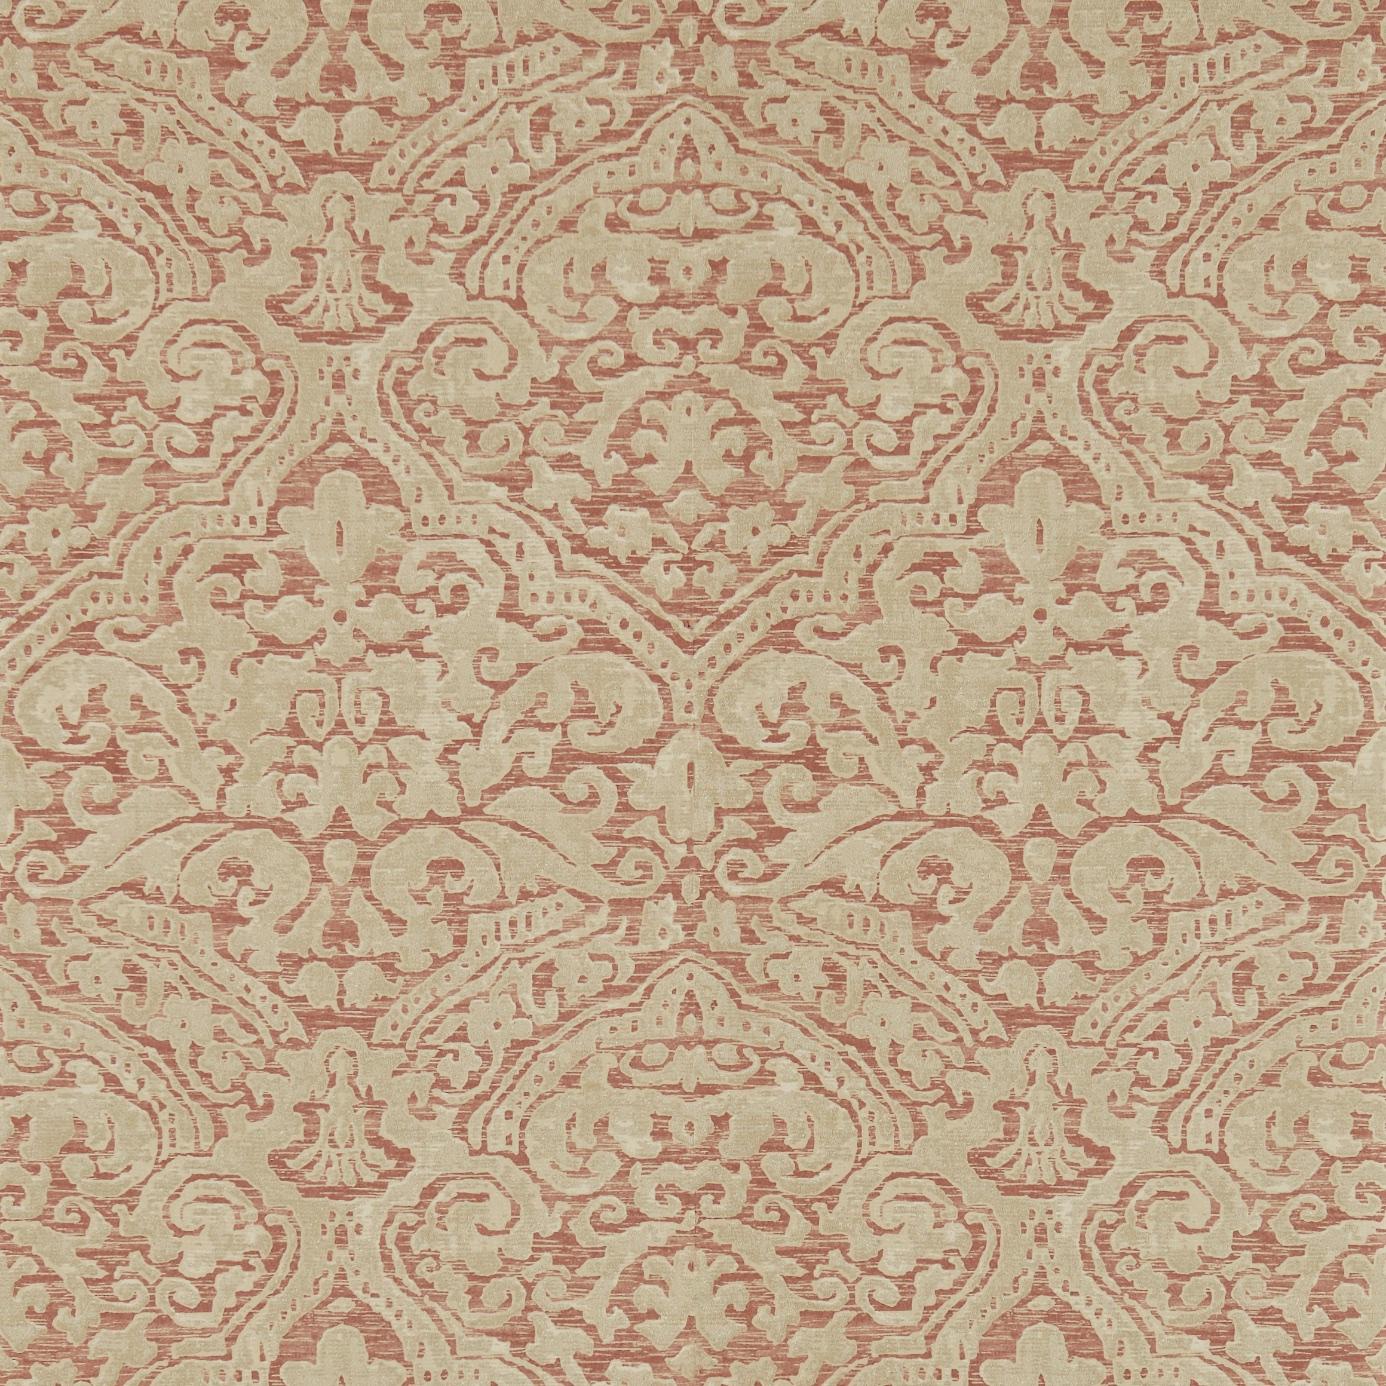 Zoffany   Renaissance Damask Wallpaper   INTERIORS 1386x1386